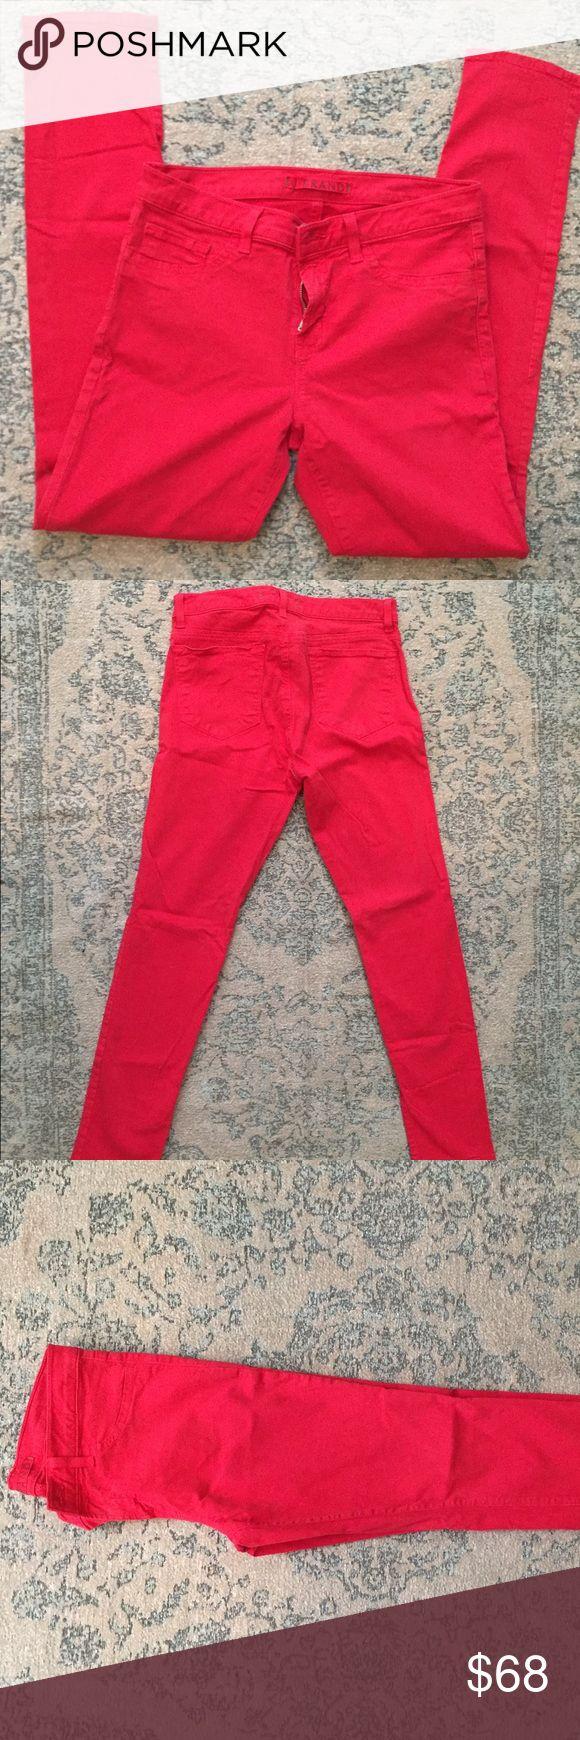 J brand Skinny Jeans J Brand red skinny jeans. Size 29. sty#811k120 cut#7513.   98% cotton 2% spandex. Worn once, needs ironing. J Brand Jeans Skinny